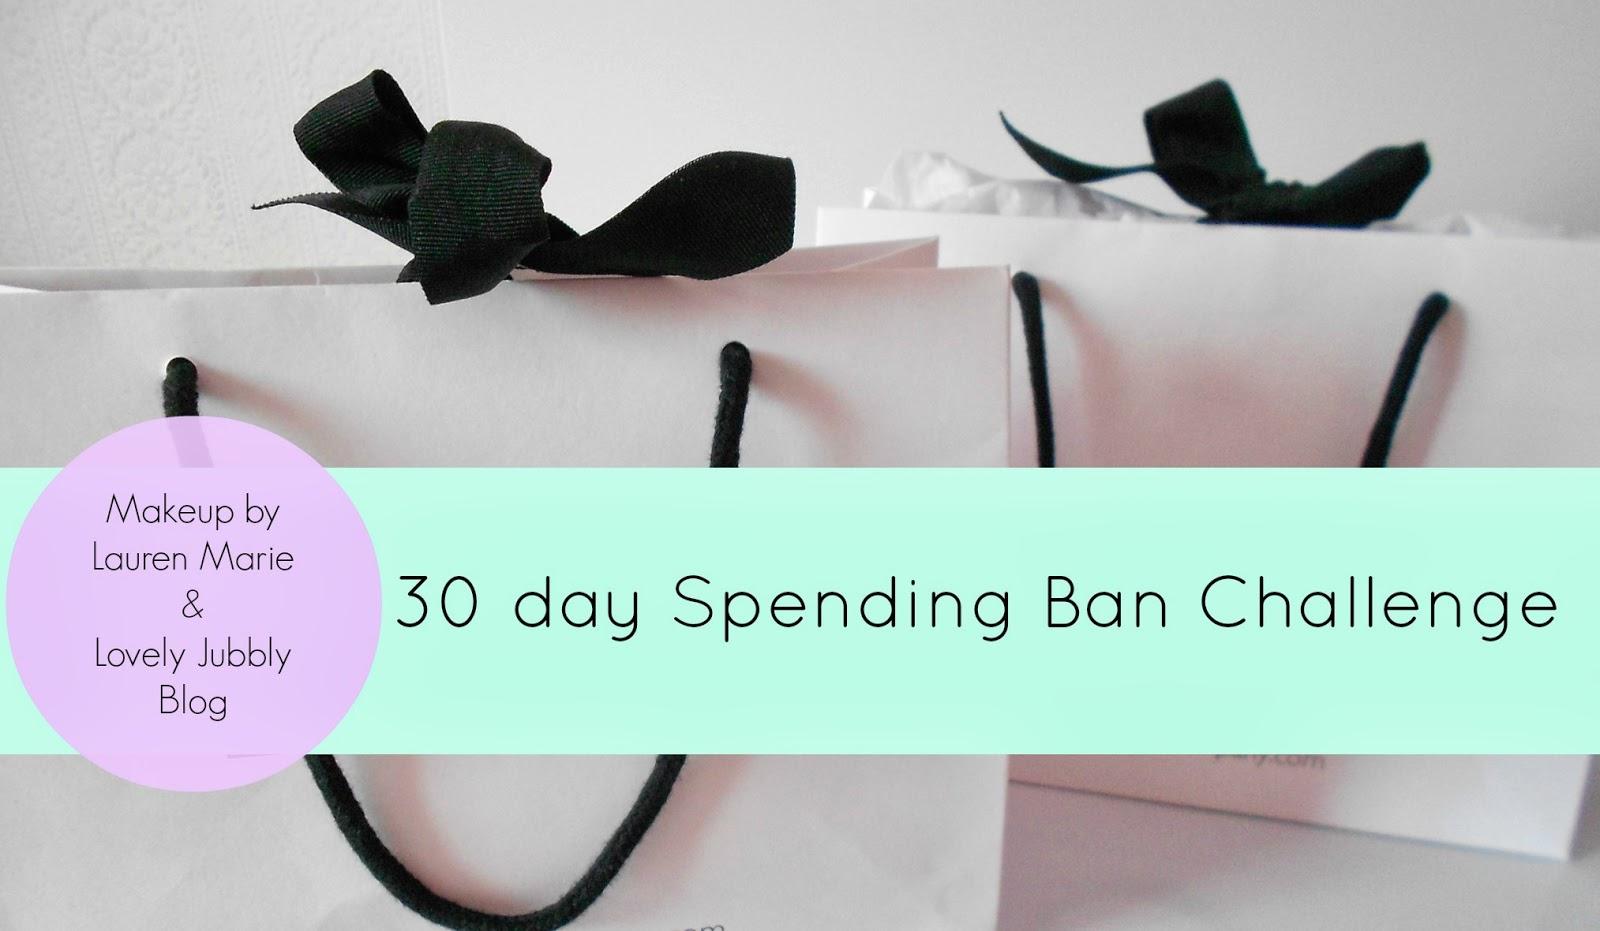 30 day spending challenge makeup beauty blog blogger